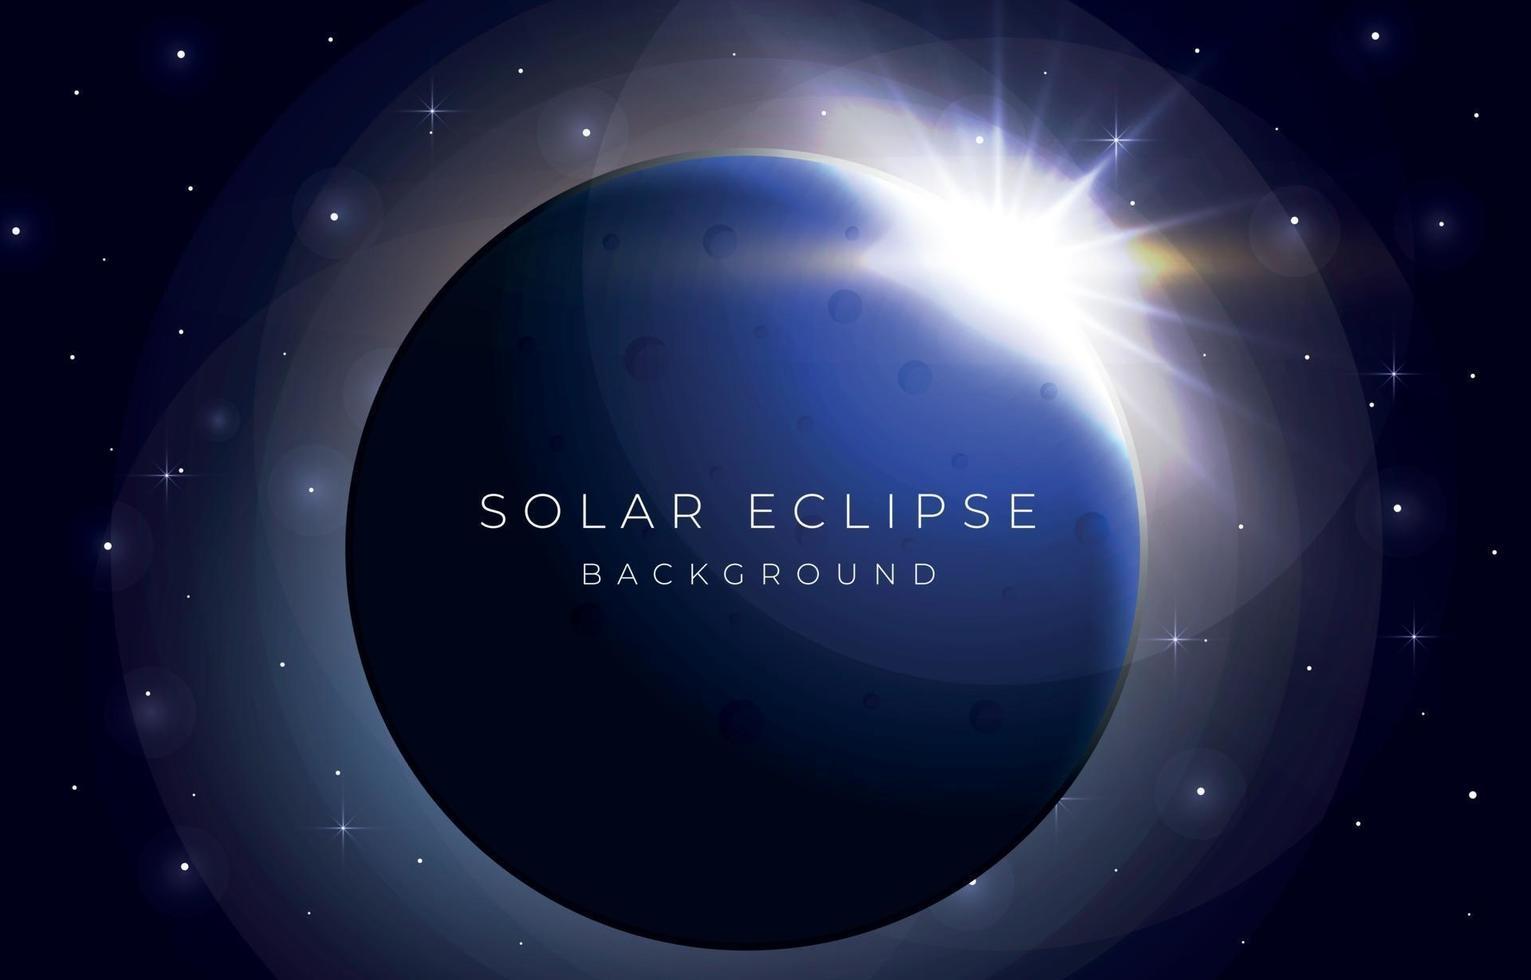 Solar Eclipse Background vector